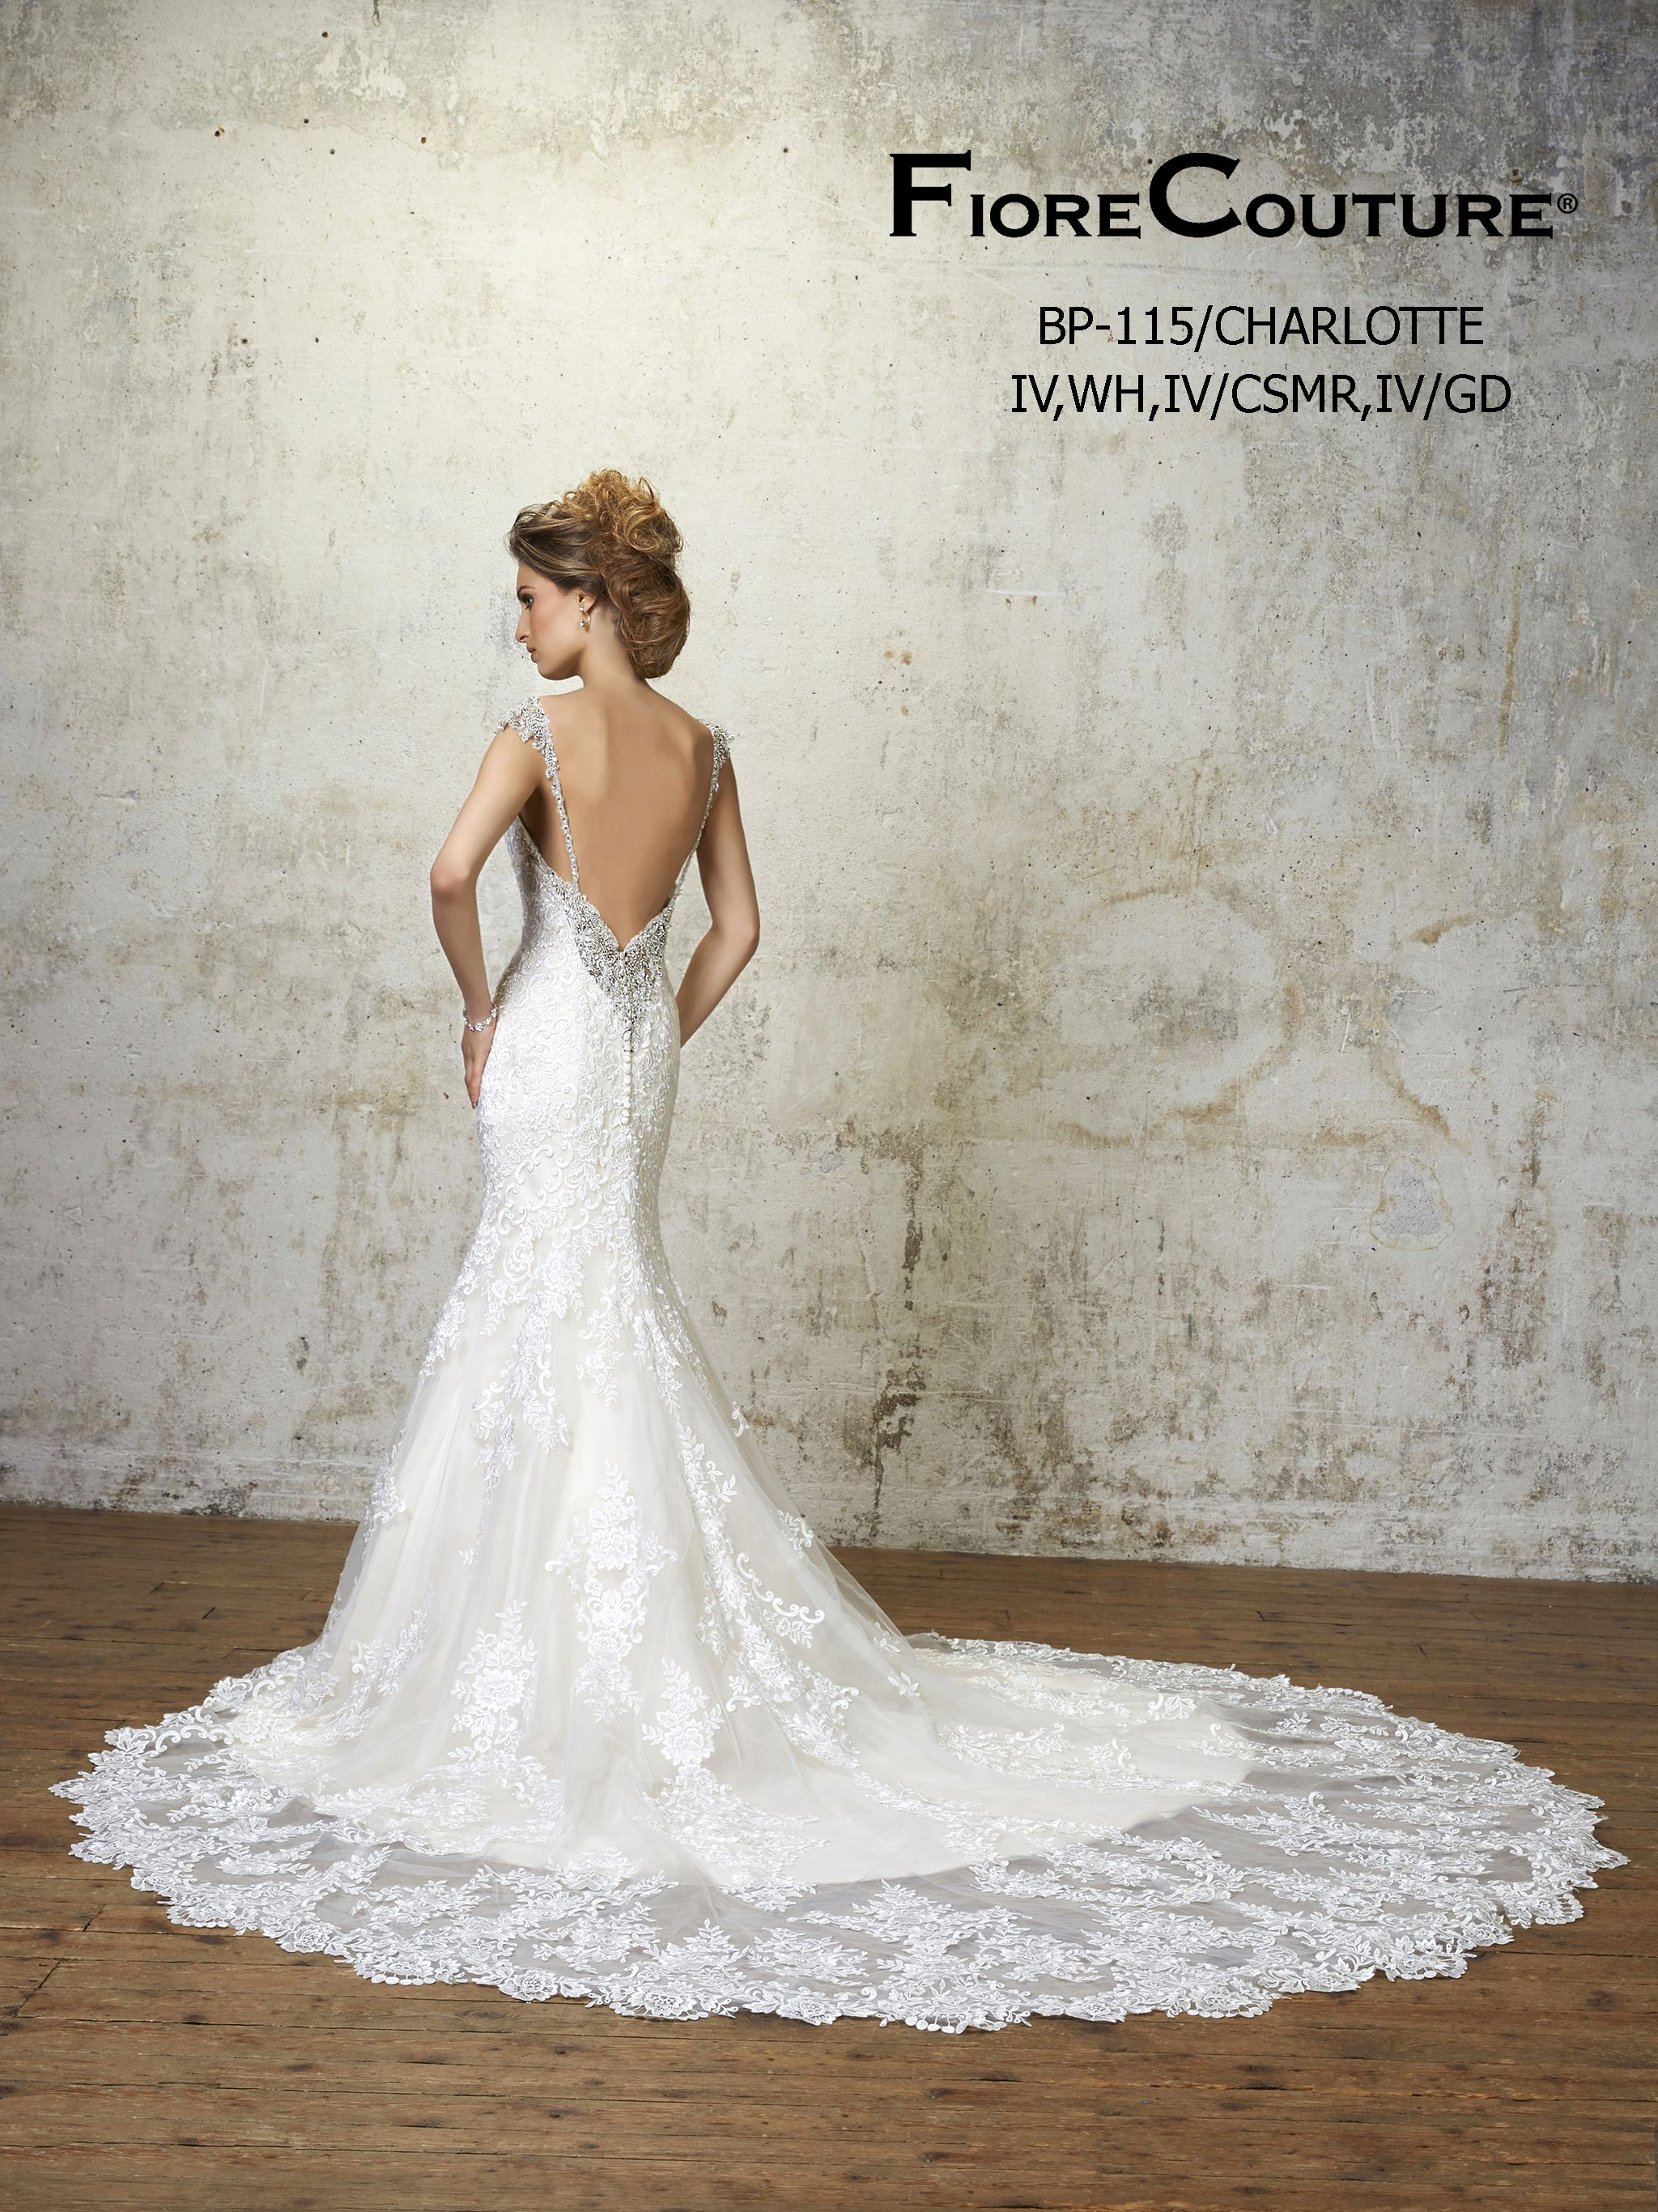 Fiore Couture Charlotte Wedding Stylescharlotte